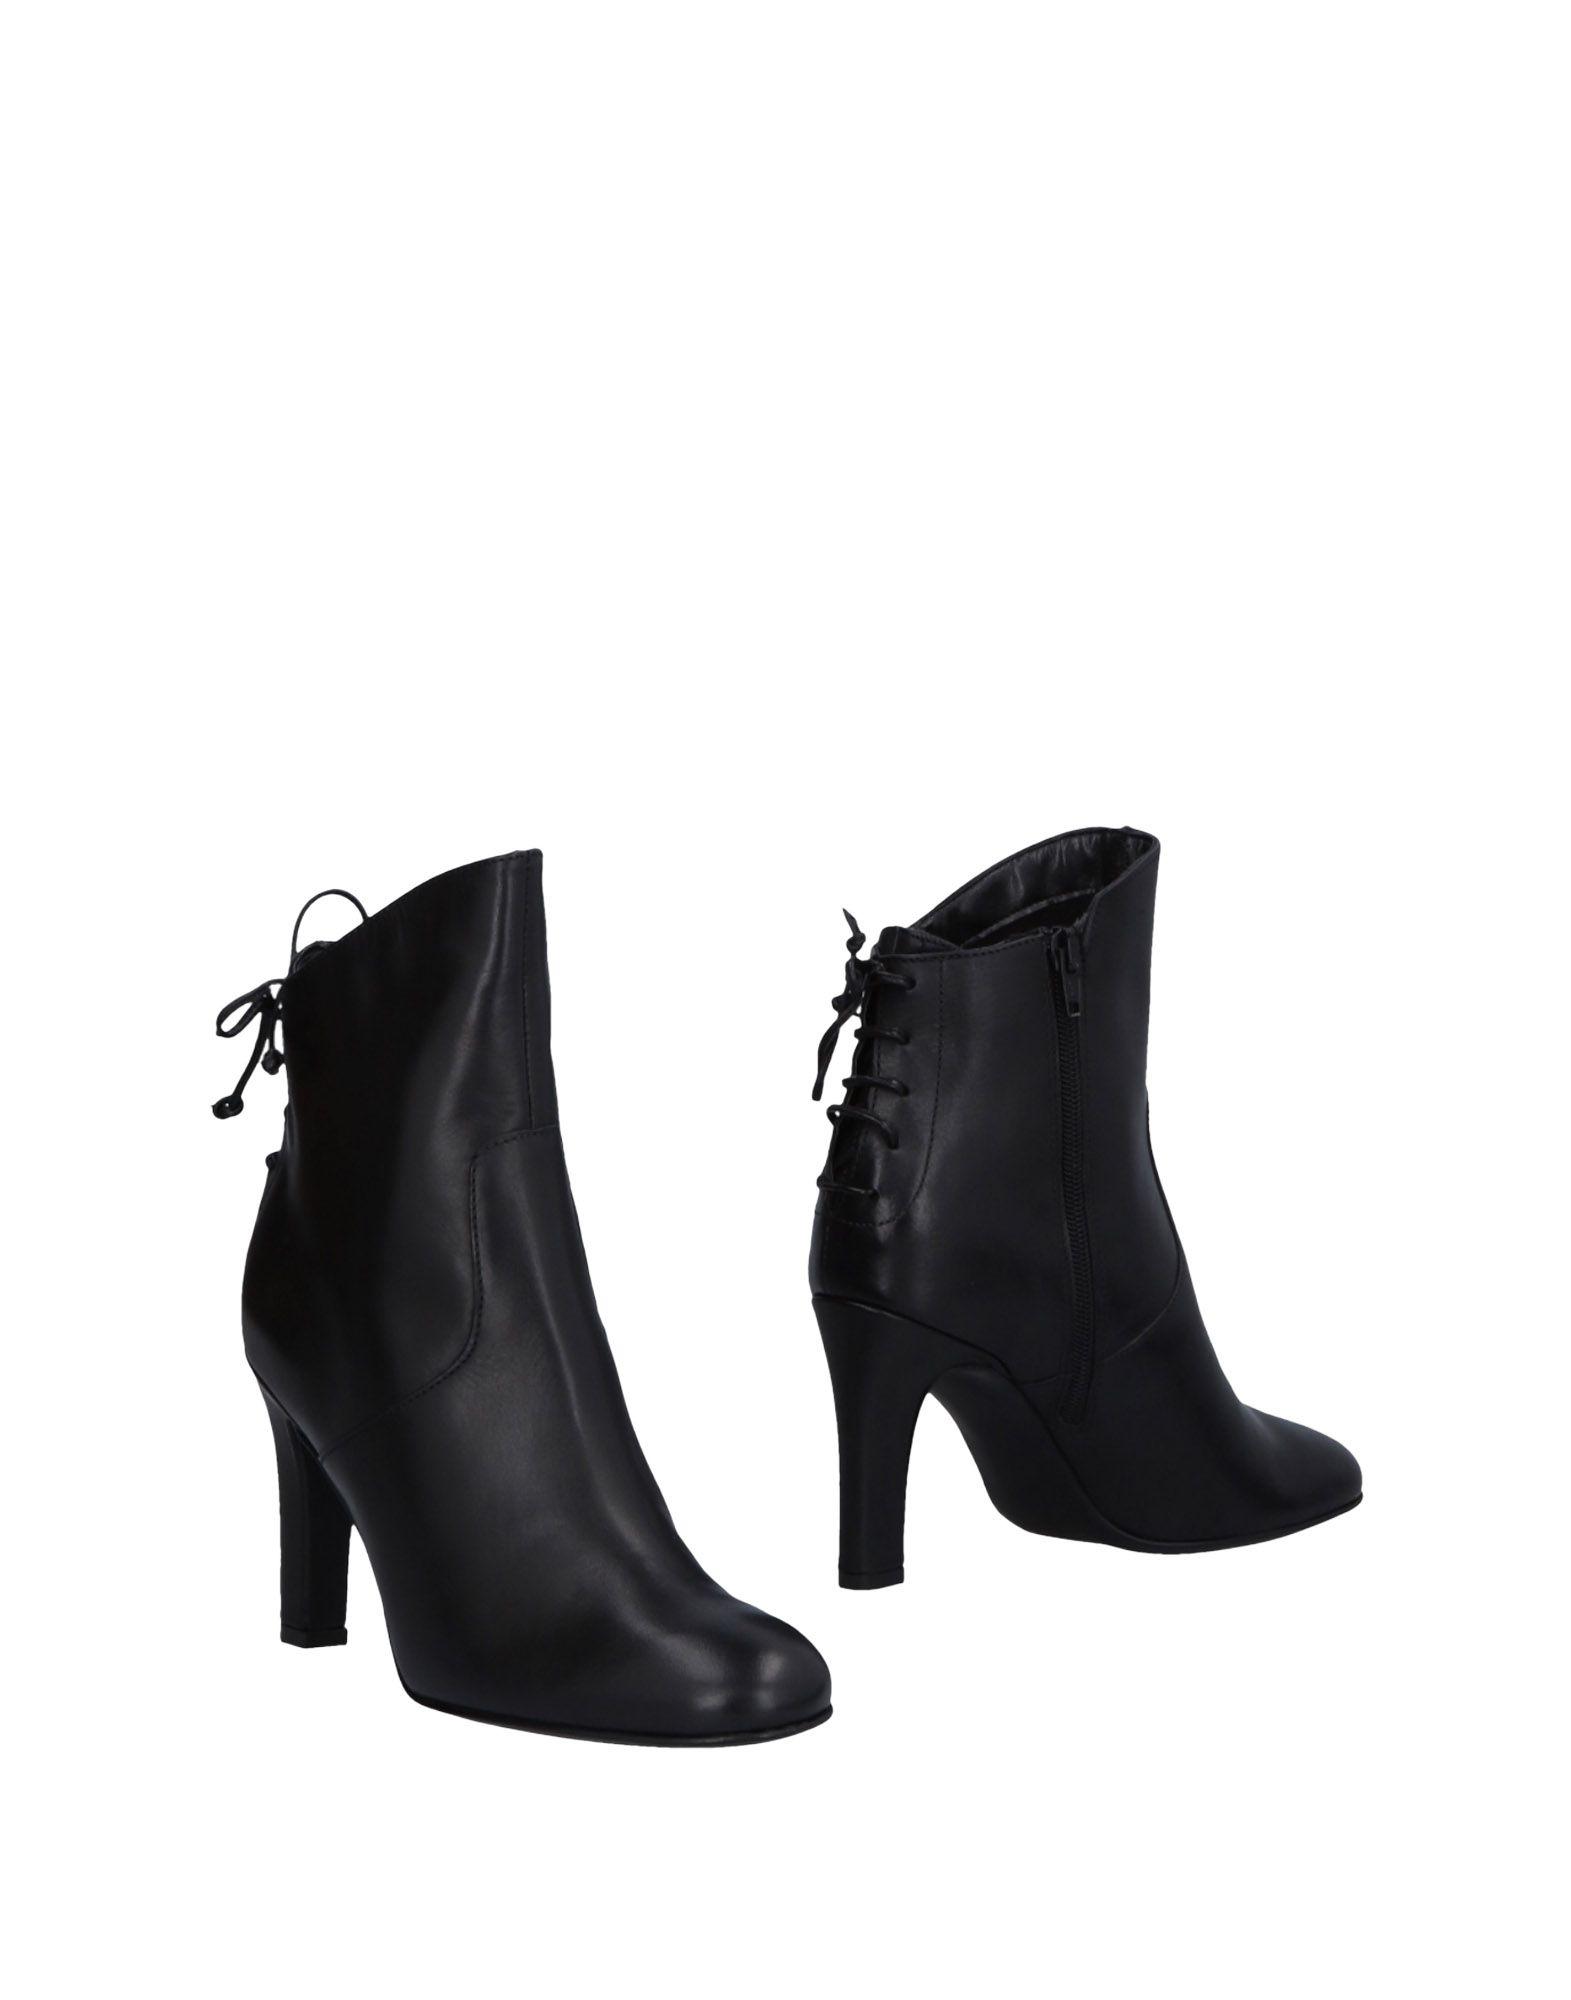 Paola Ferri Stiefelette Damen  11475976WX Gute Gute Gute Qualität beliebte Schuhe 41953d